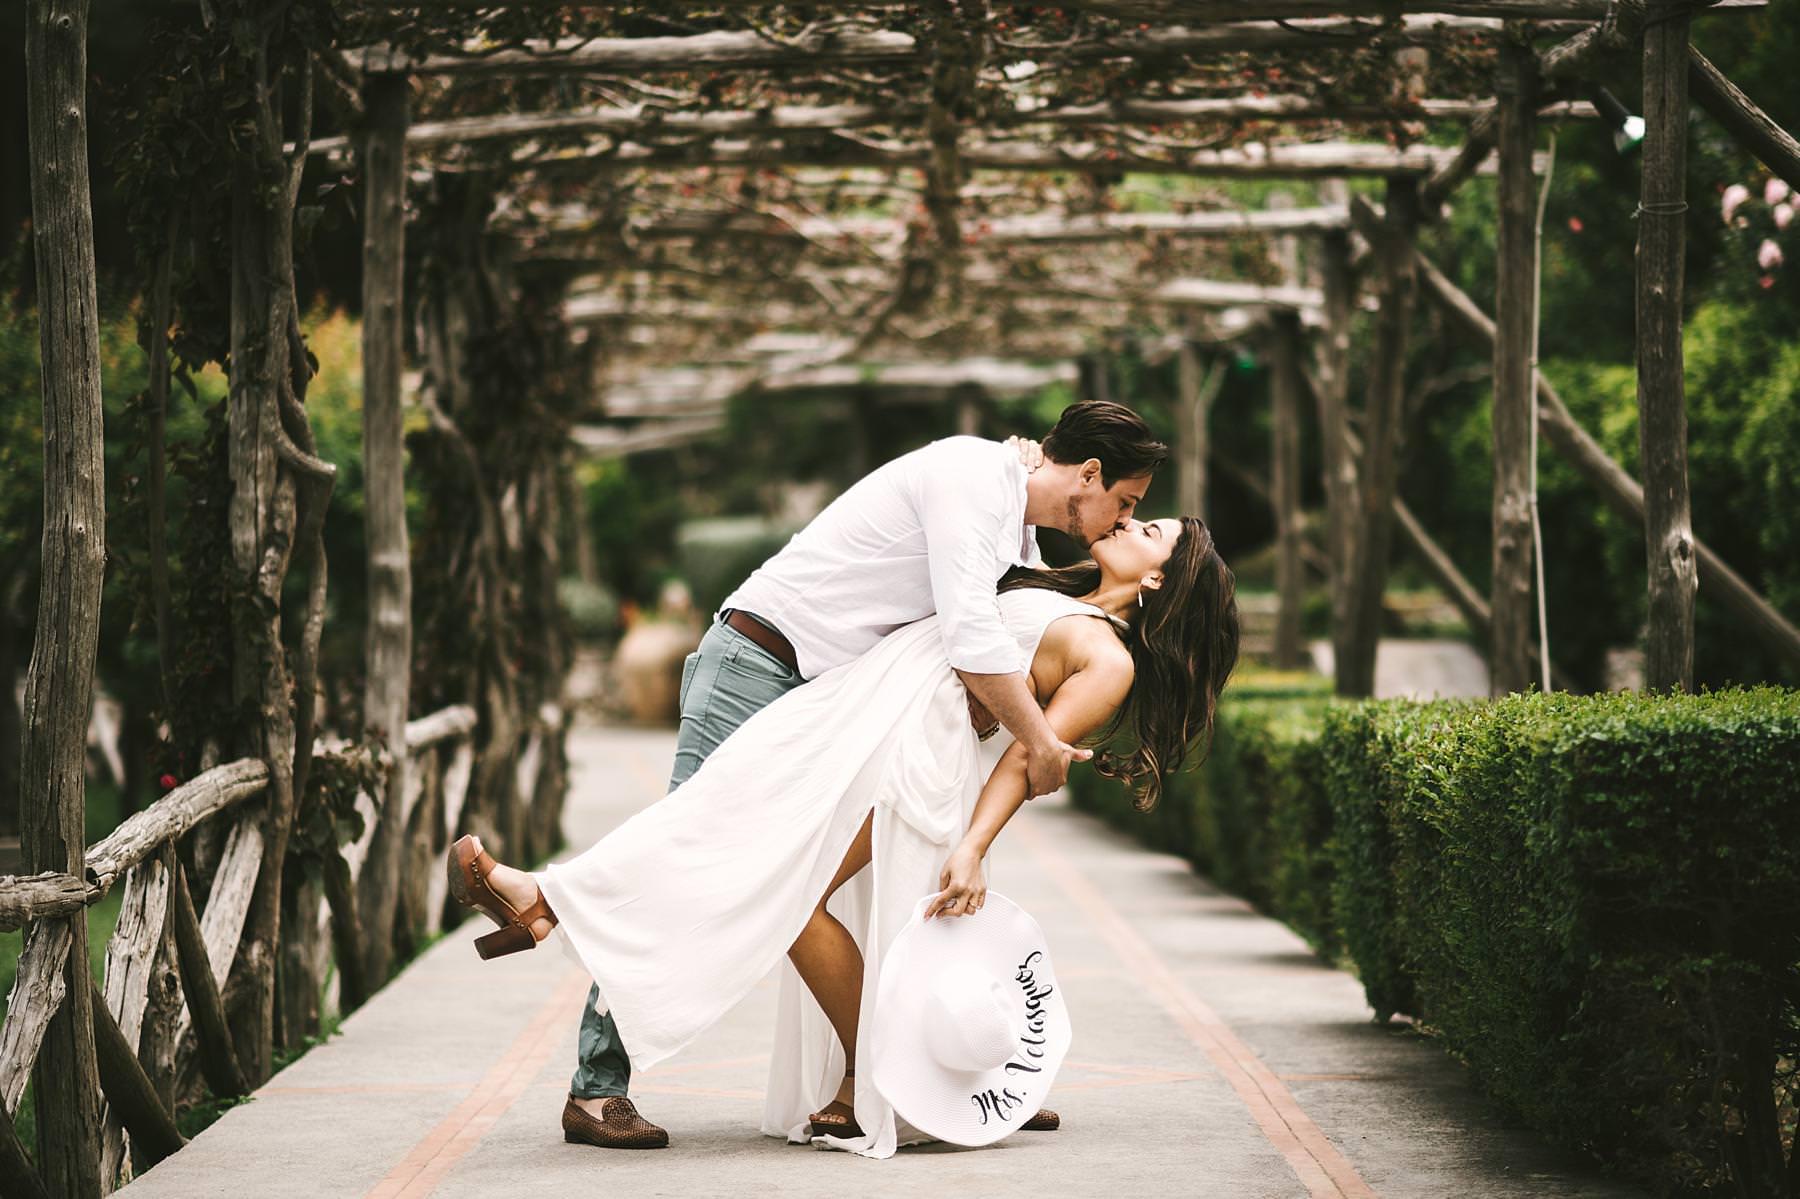 Unforgettable destination pre-wedding photo tour in the streets of Capri